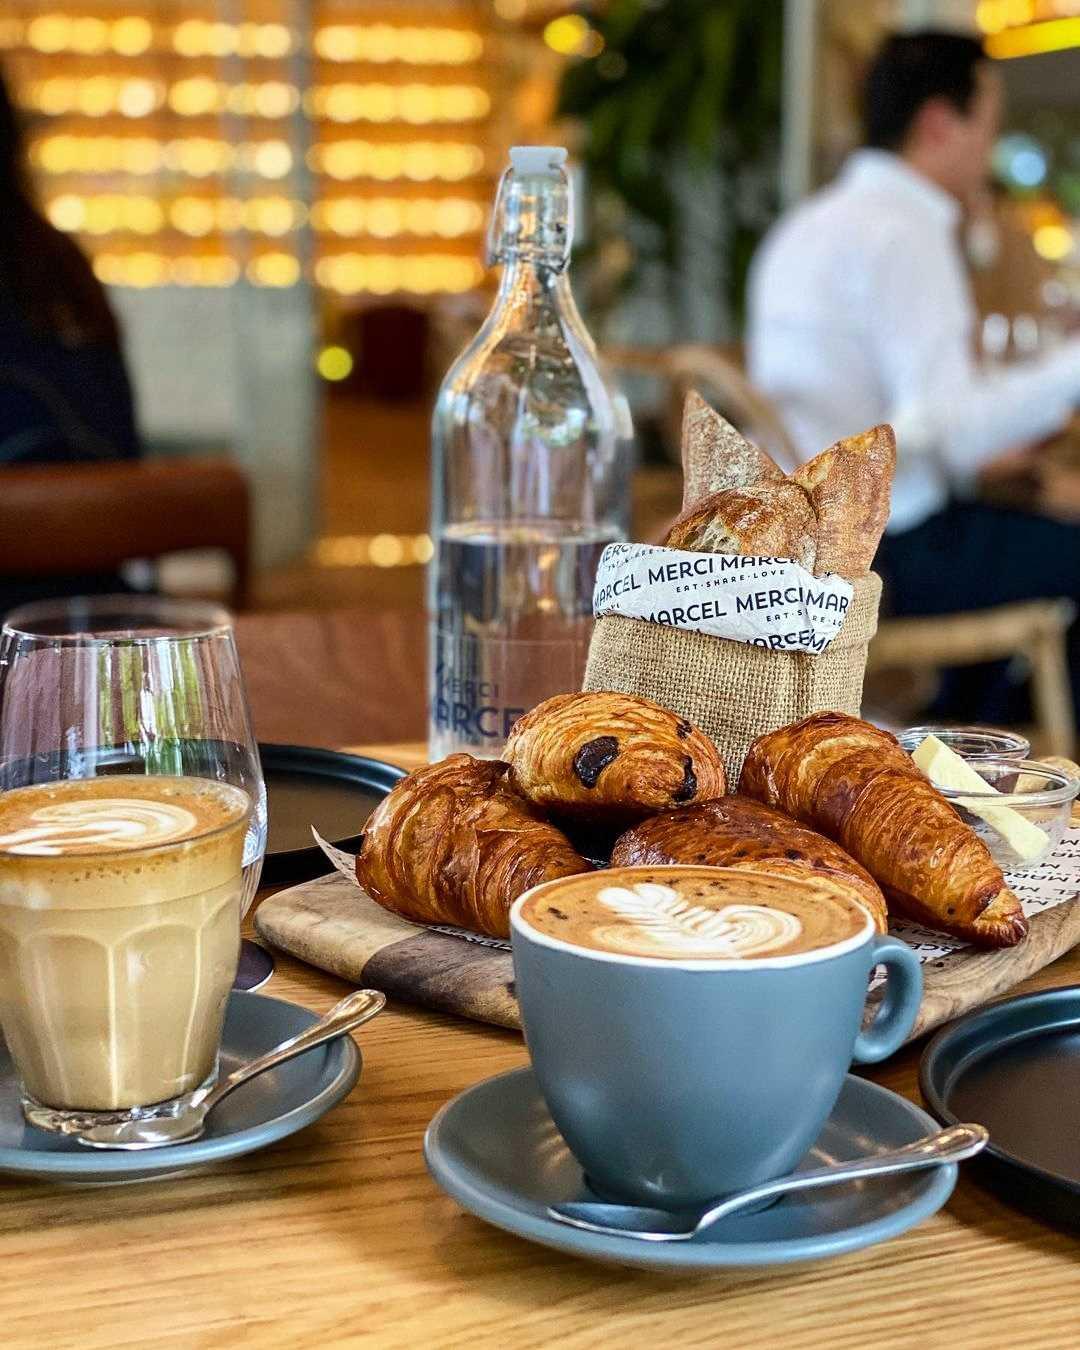 merci marcel french bakery croissants